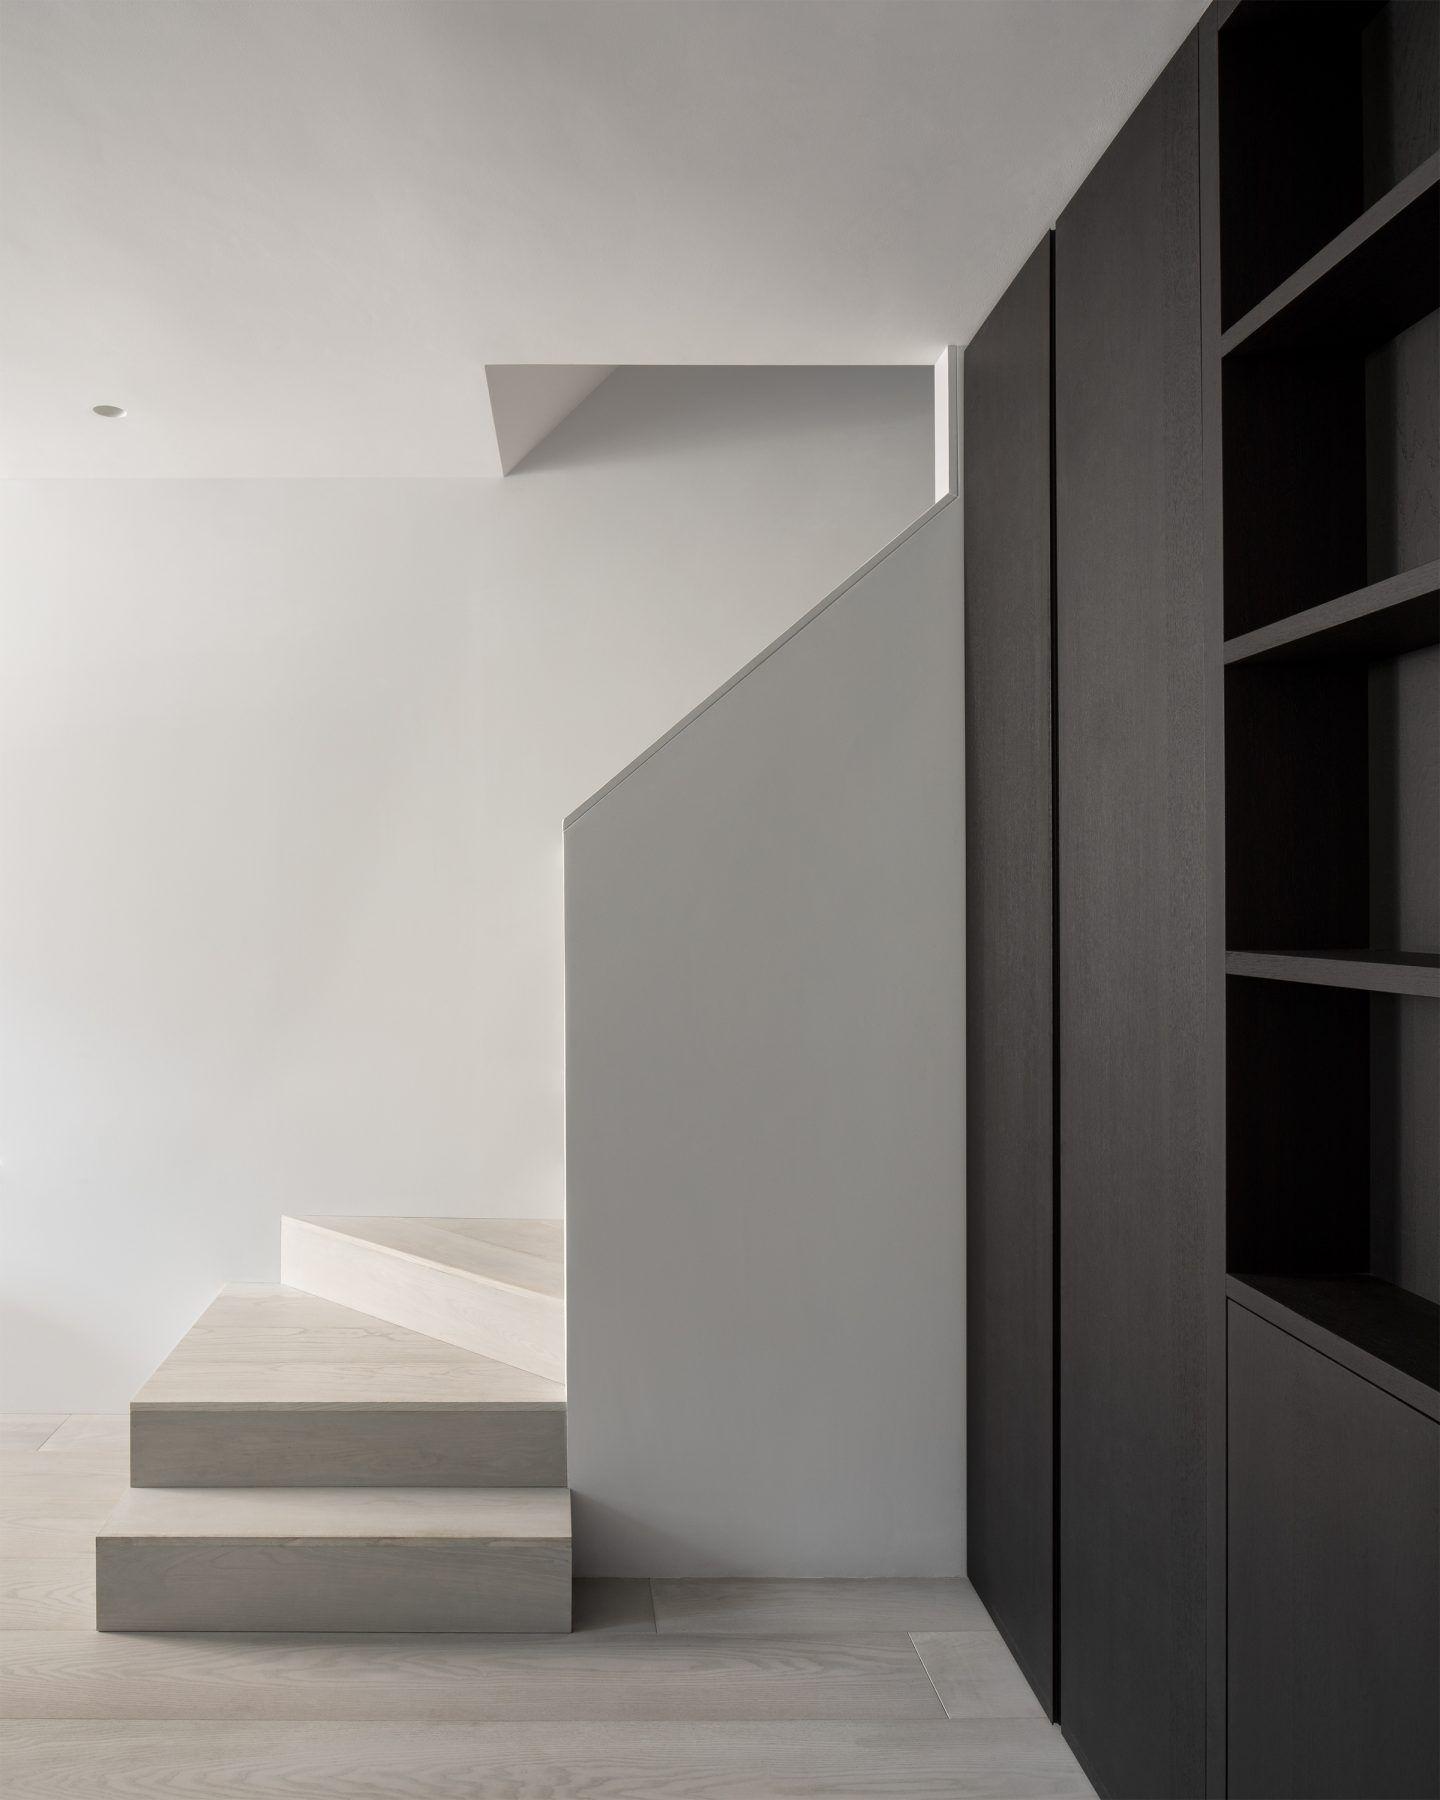 IGNANT-Architecture-Al-Jawad-Pike-Elsley-Road-10